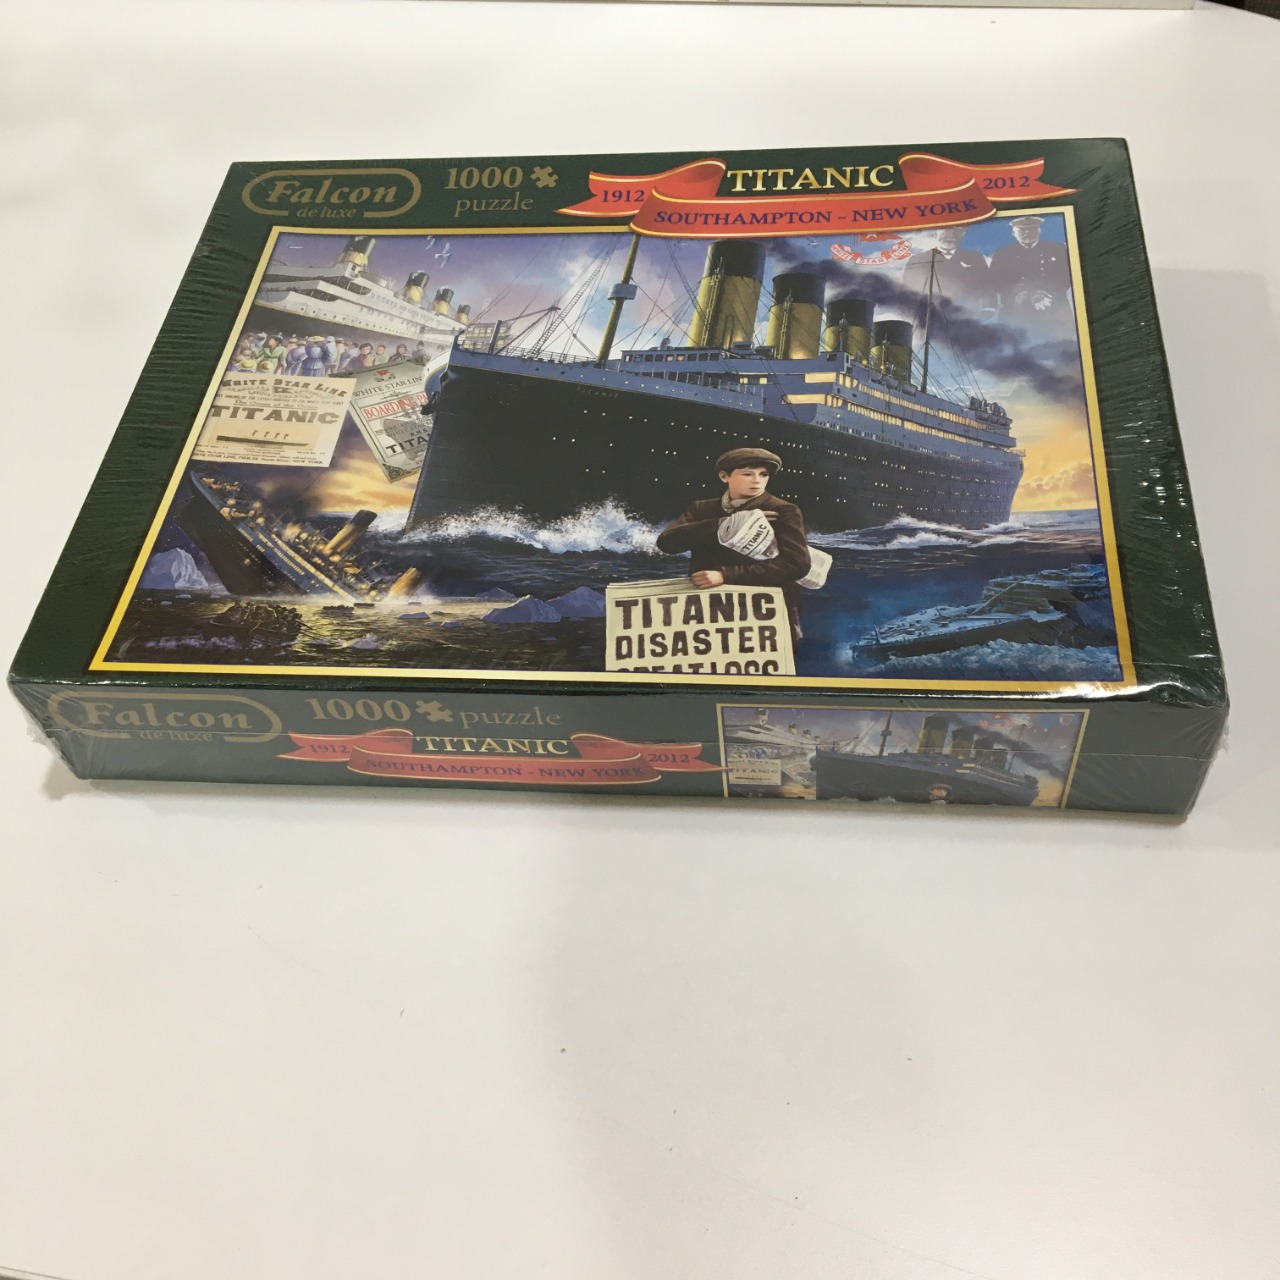 50% Off - Titanic Southampton New York Puzzle (1912 - 2012)